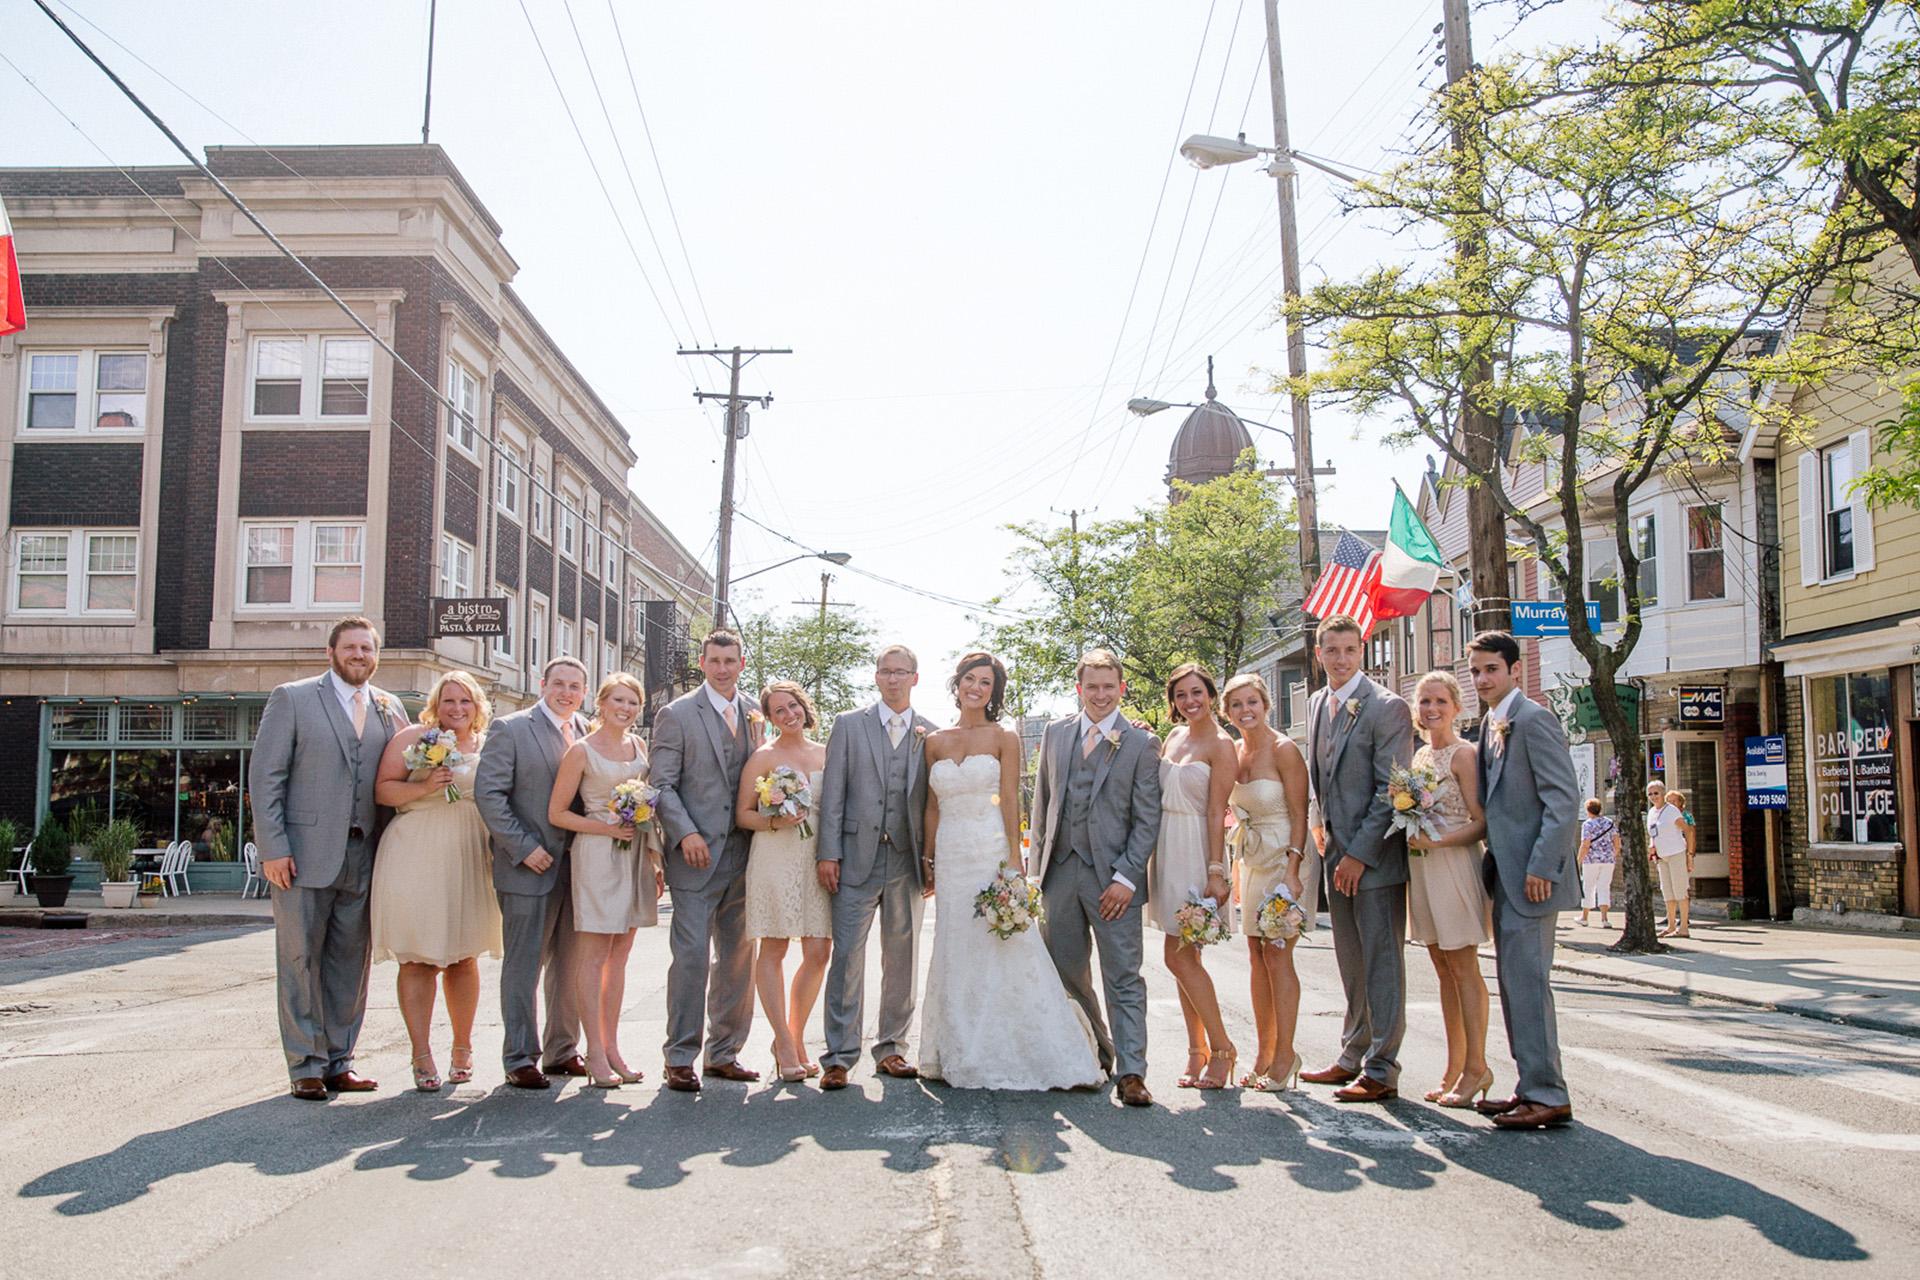 Ariel International Center Wedding Photos 28.jpg